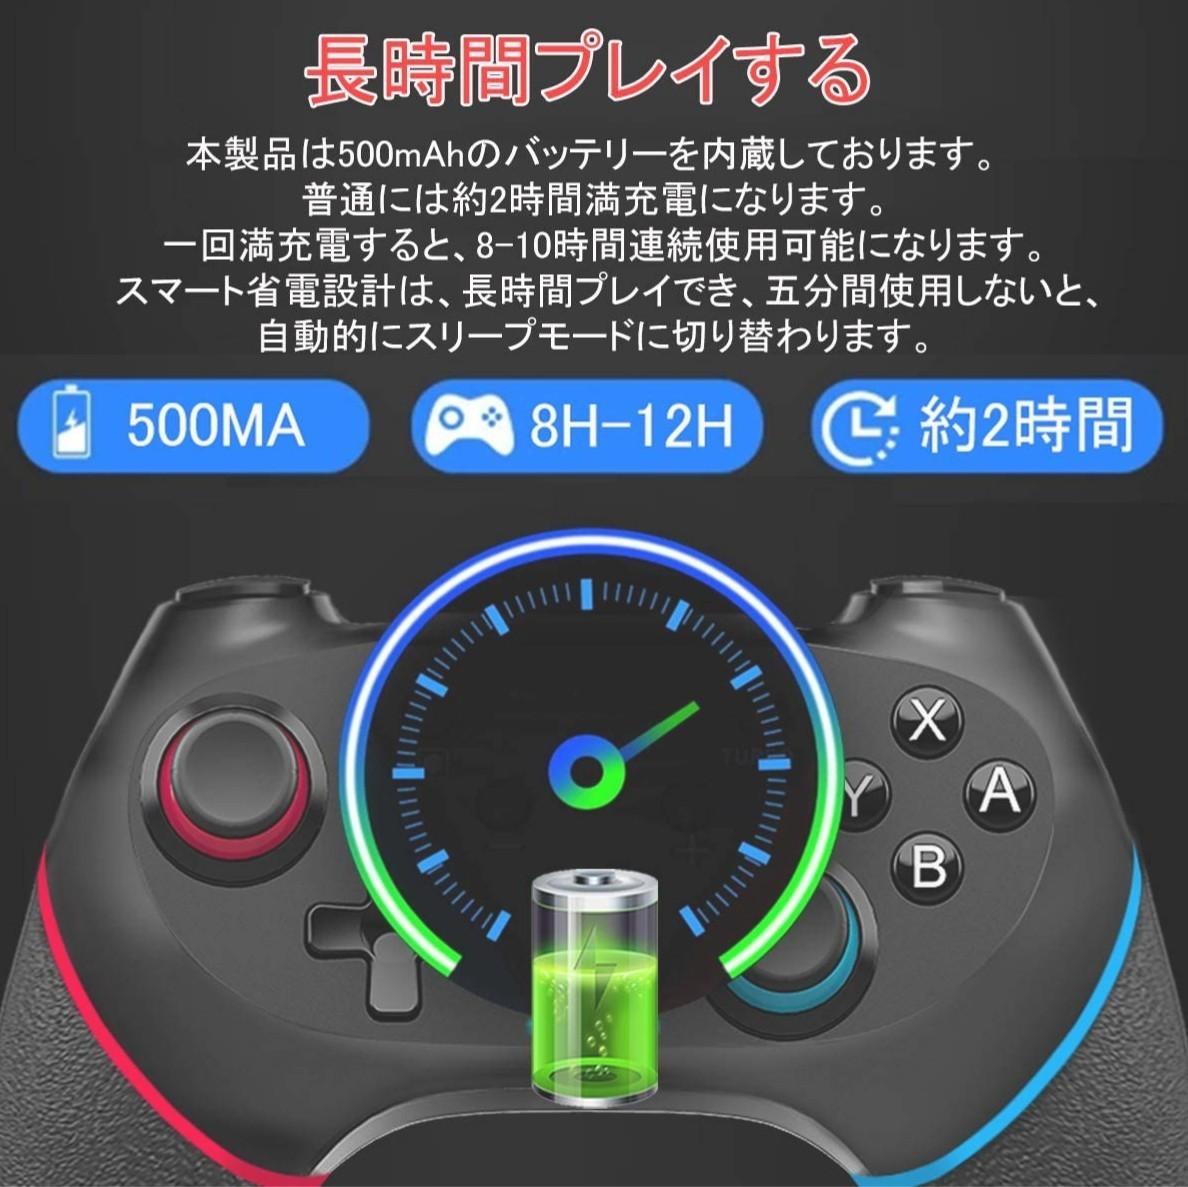 Switch Pro コントローラー 無線 HD振動 小型6軸 ジャイロセンサー